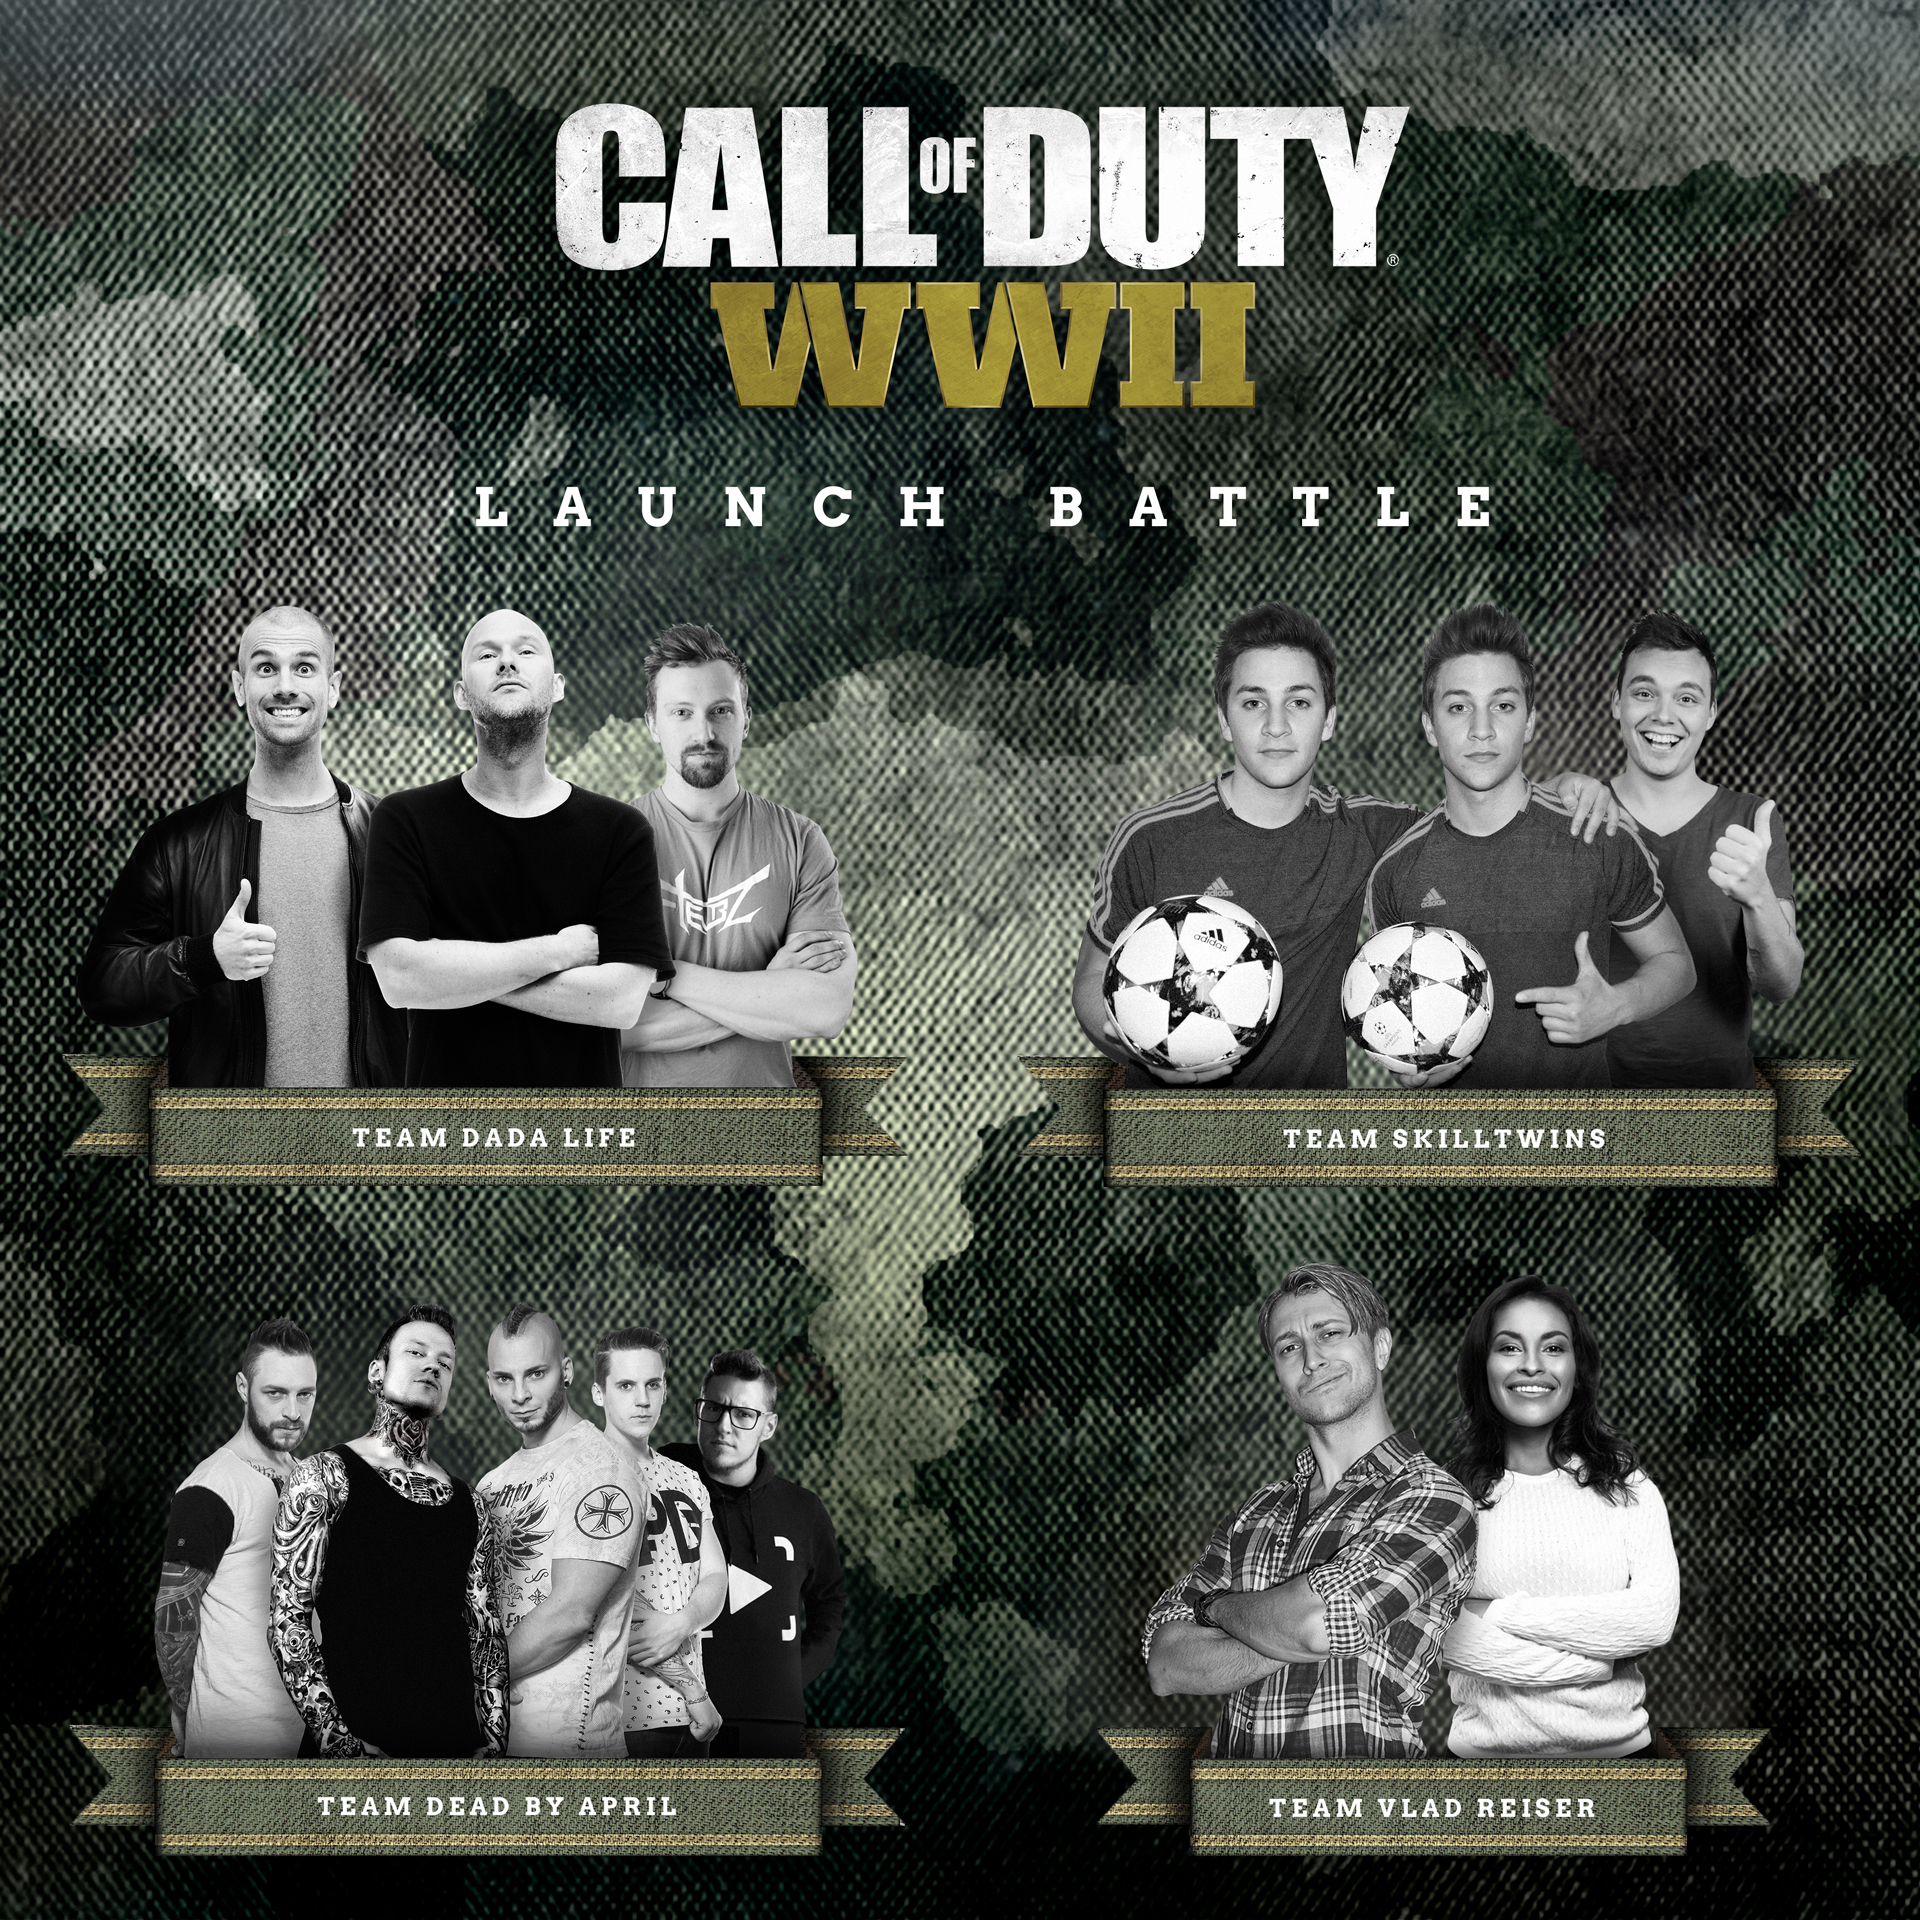 callofduty-WWII-KeyVisual-square